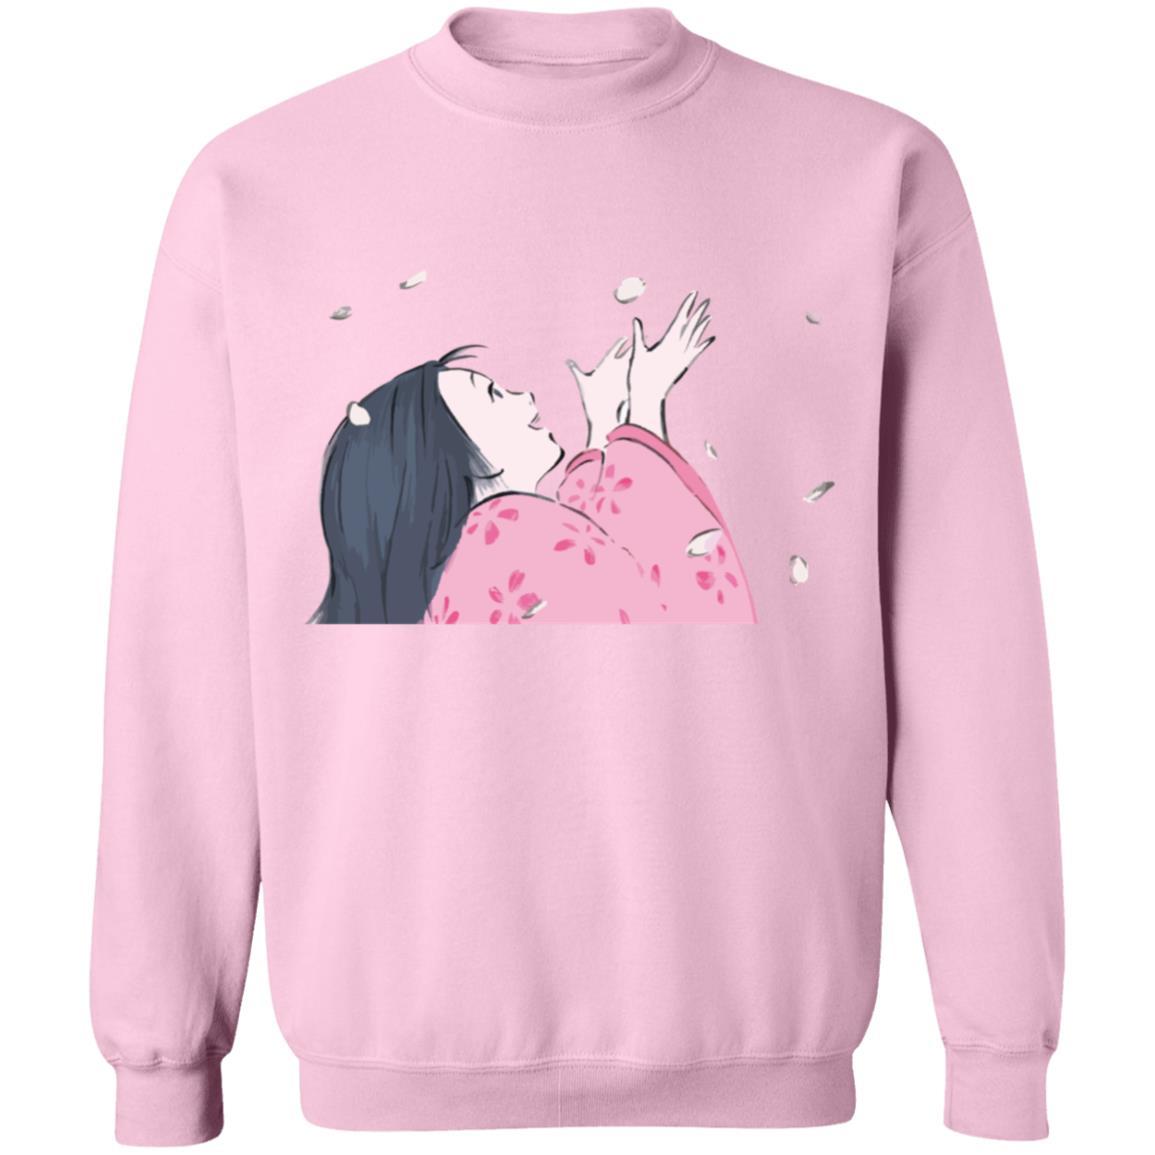 Princess Kaguya Sweatshirt Unisex